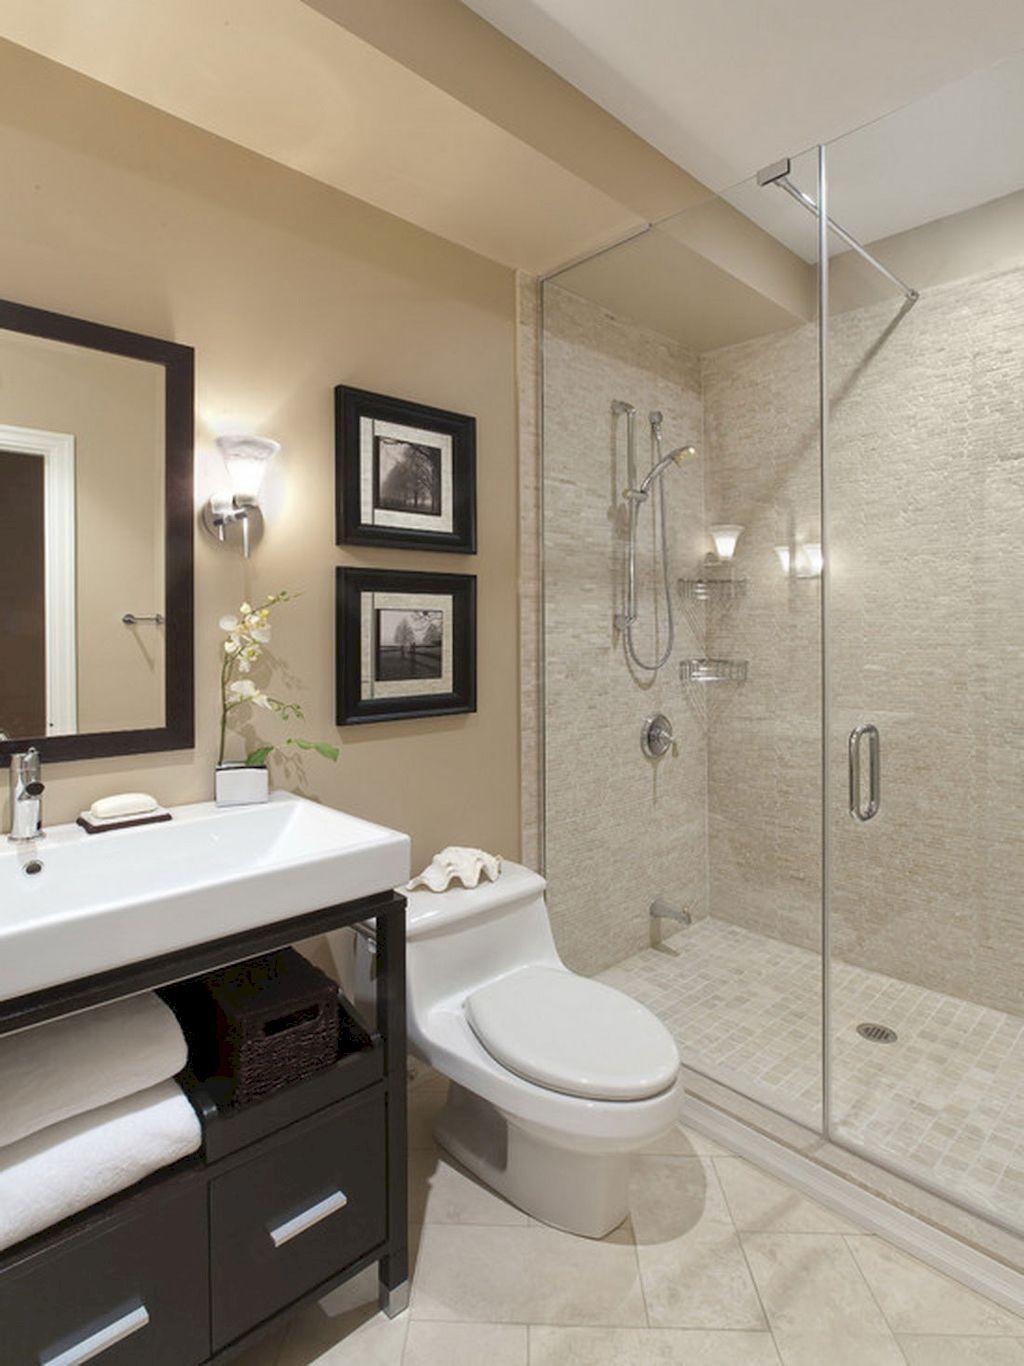 Merveilleux 80 Stunning Tile Shower Designs Ideas For Bathroom Remodel (21)